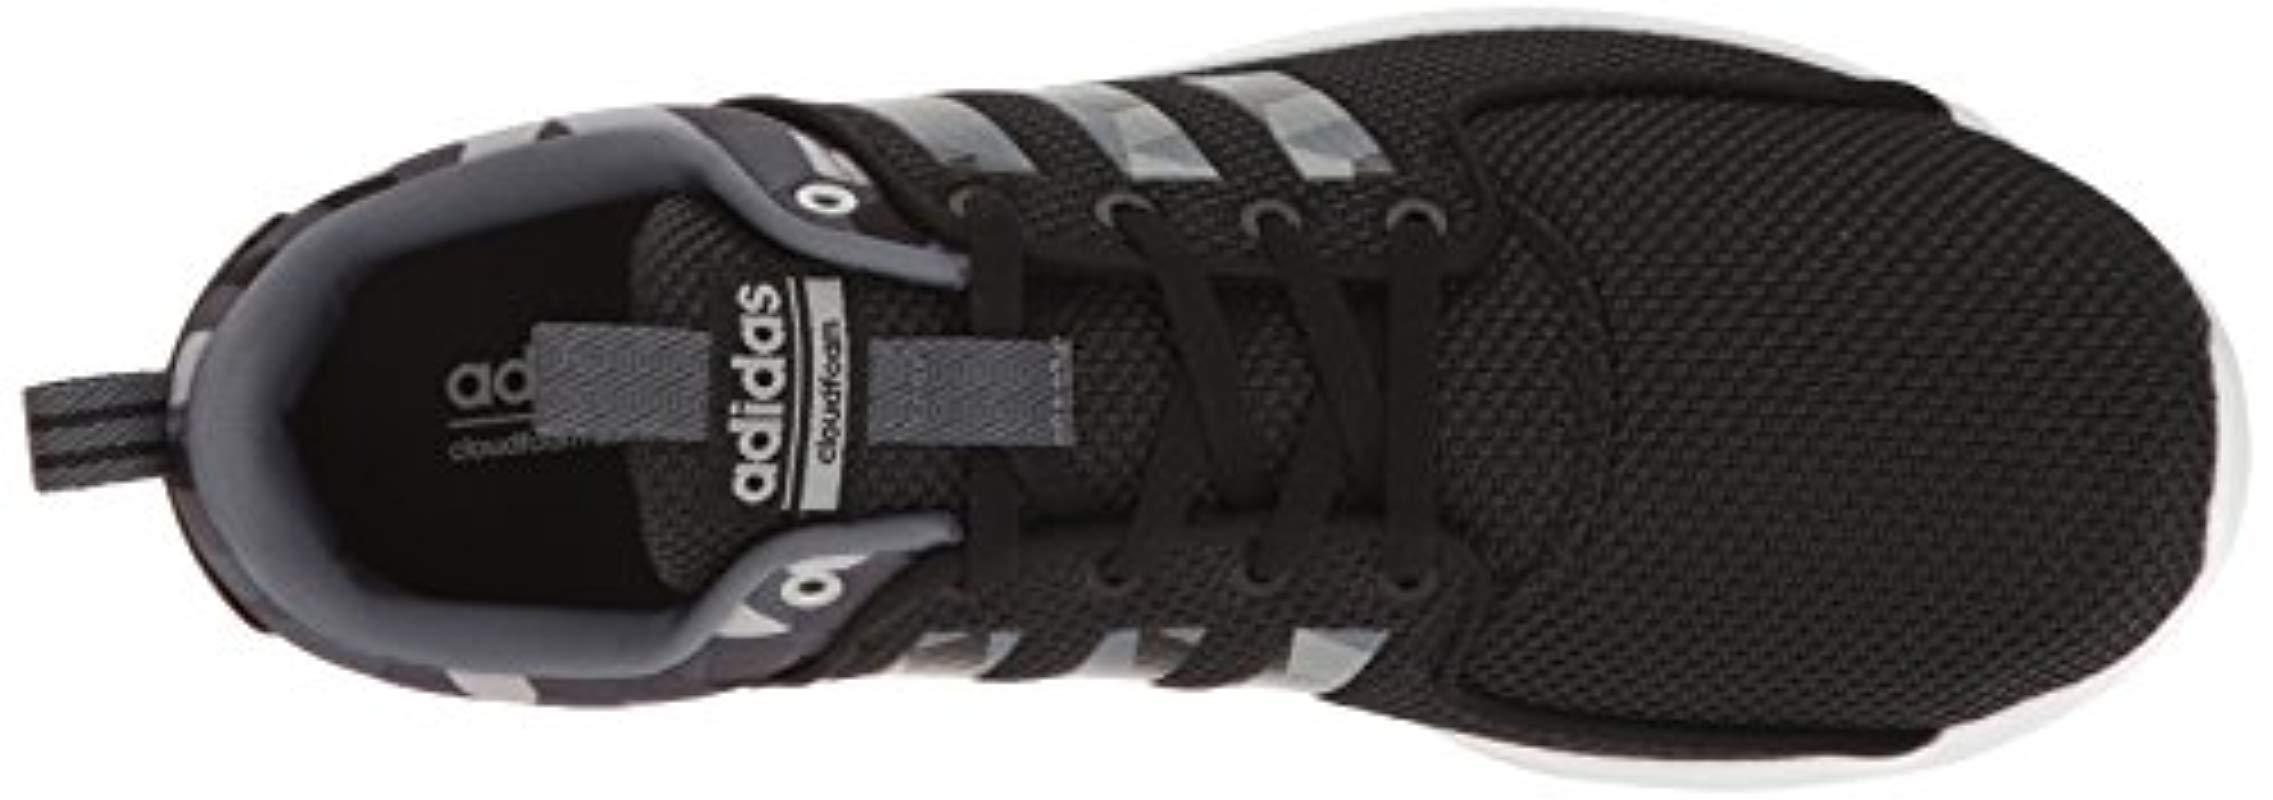 new arrival 01295 e3617 Adidas - Black Cloudfoam Lite Racer Running Shoe - Lyst. View fullscreen